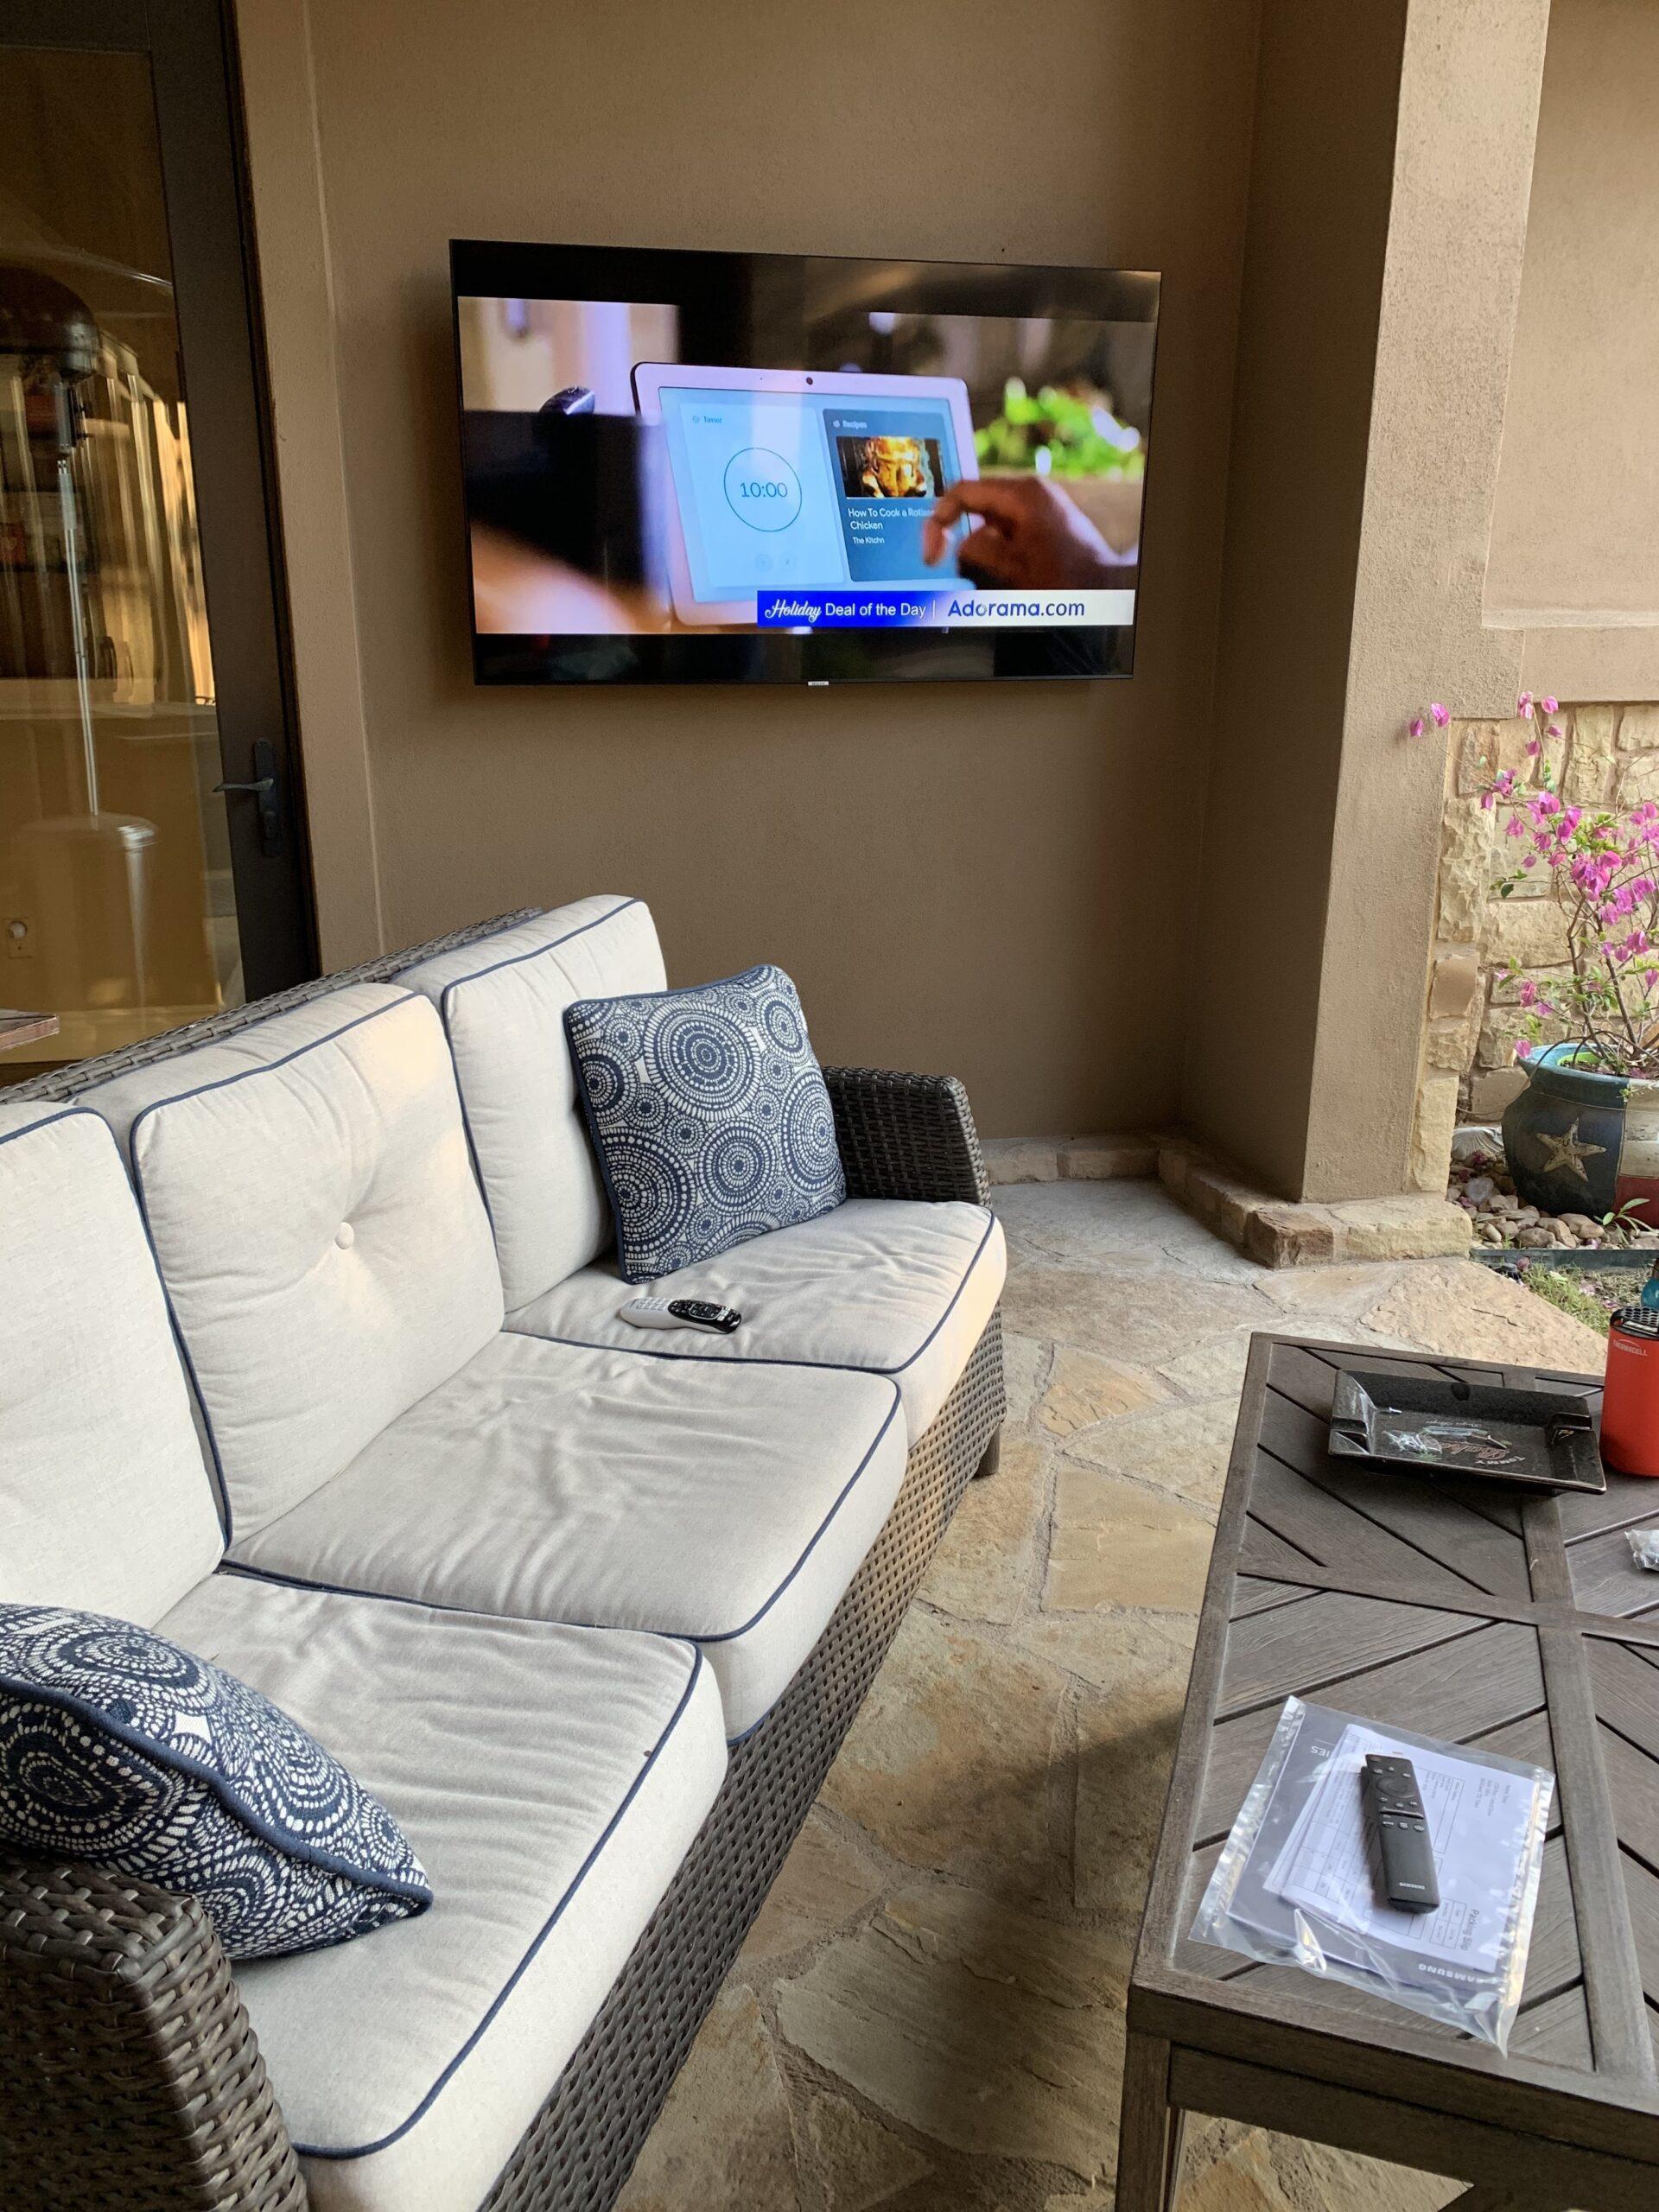 Media room mounted TV